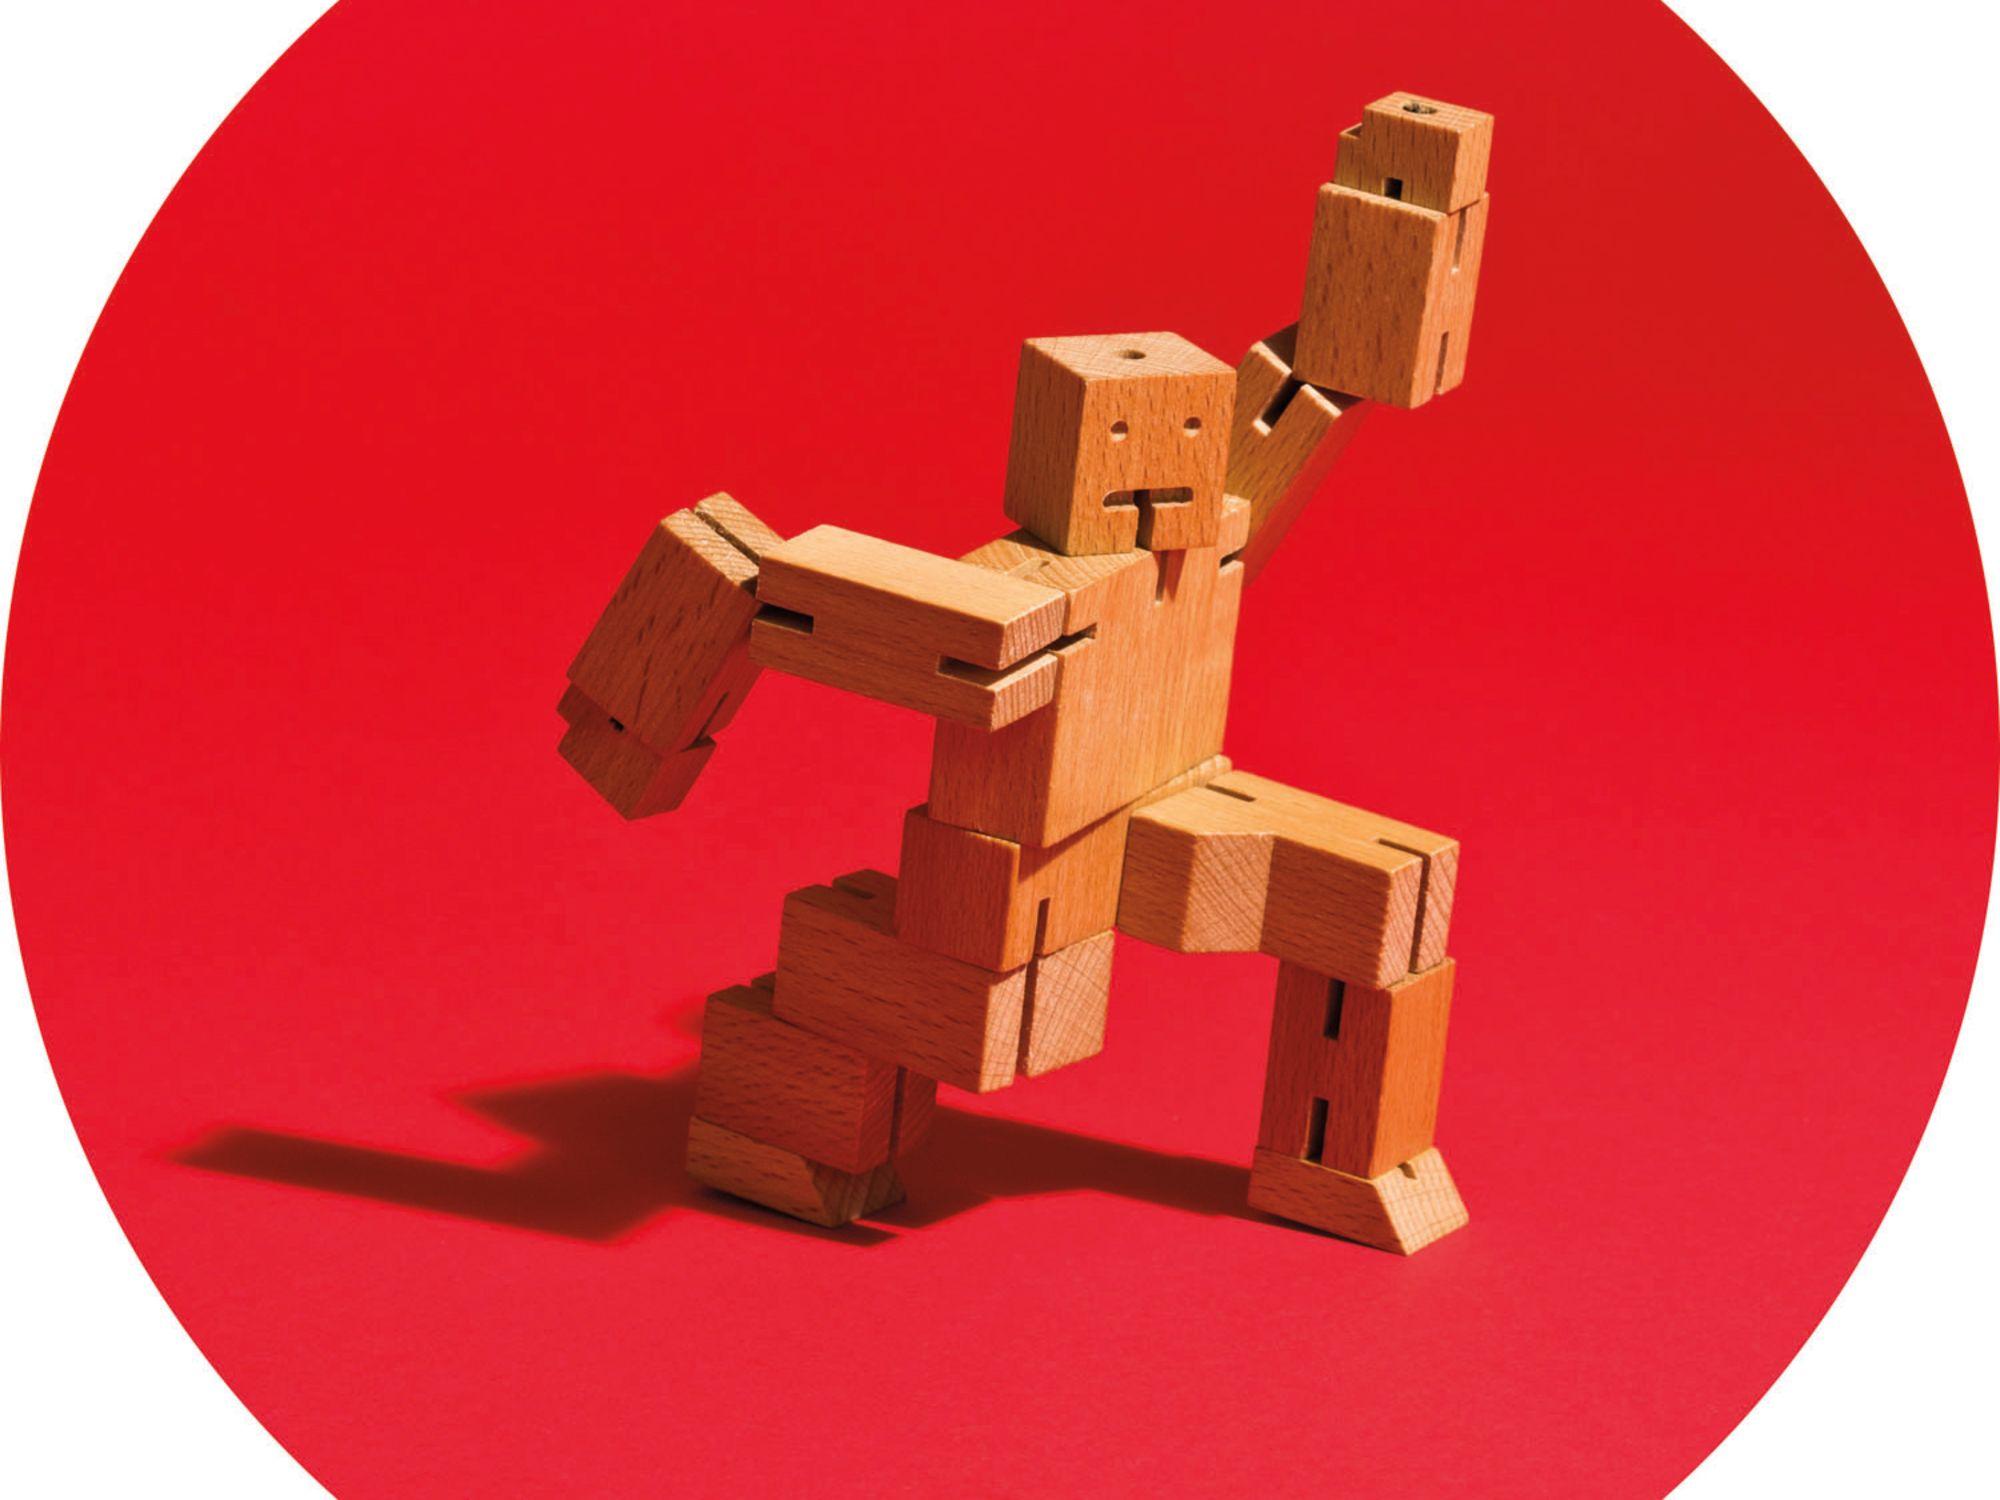 Pomo 1216 gift guide cubebot puzzle aztg0o